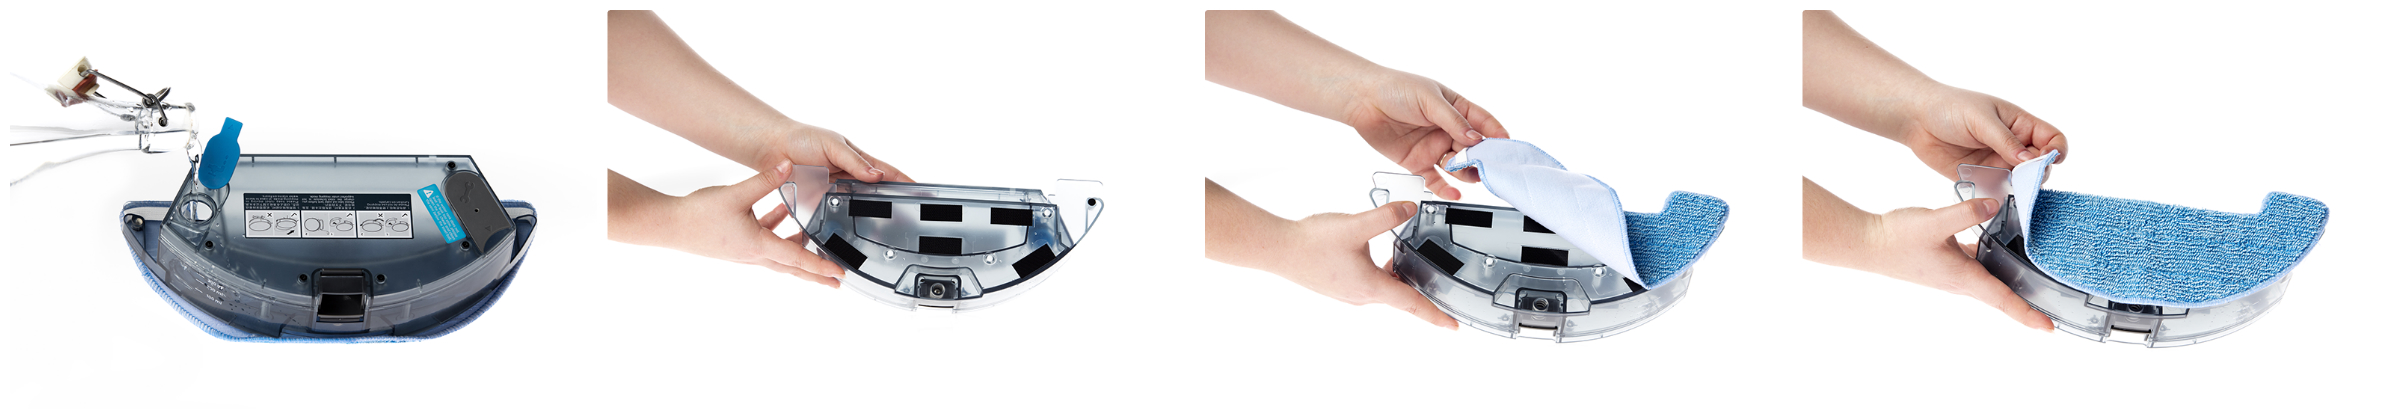 amibot robot aspirateur et laveur spirit h2o achat aspirateur robot. Black Bedroom Furniture Sets. Home Design Ideas